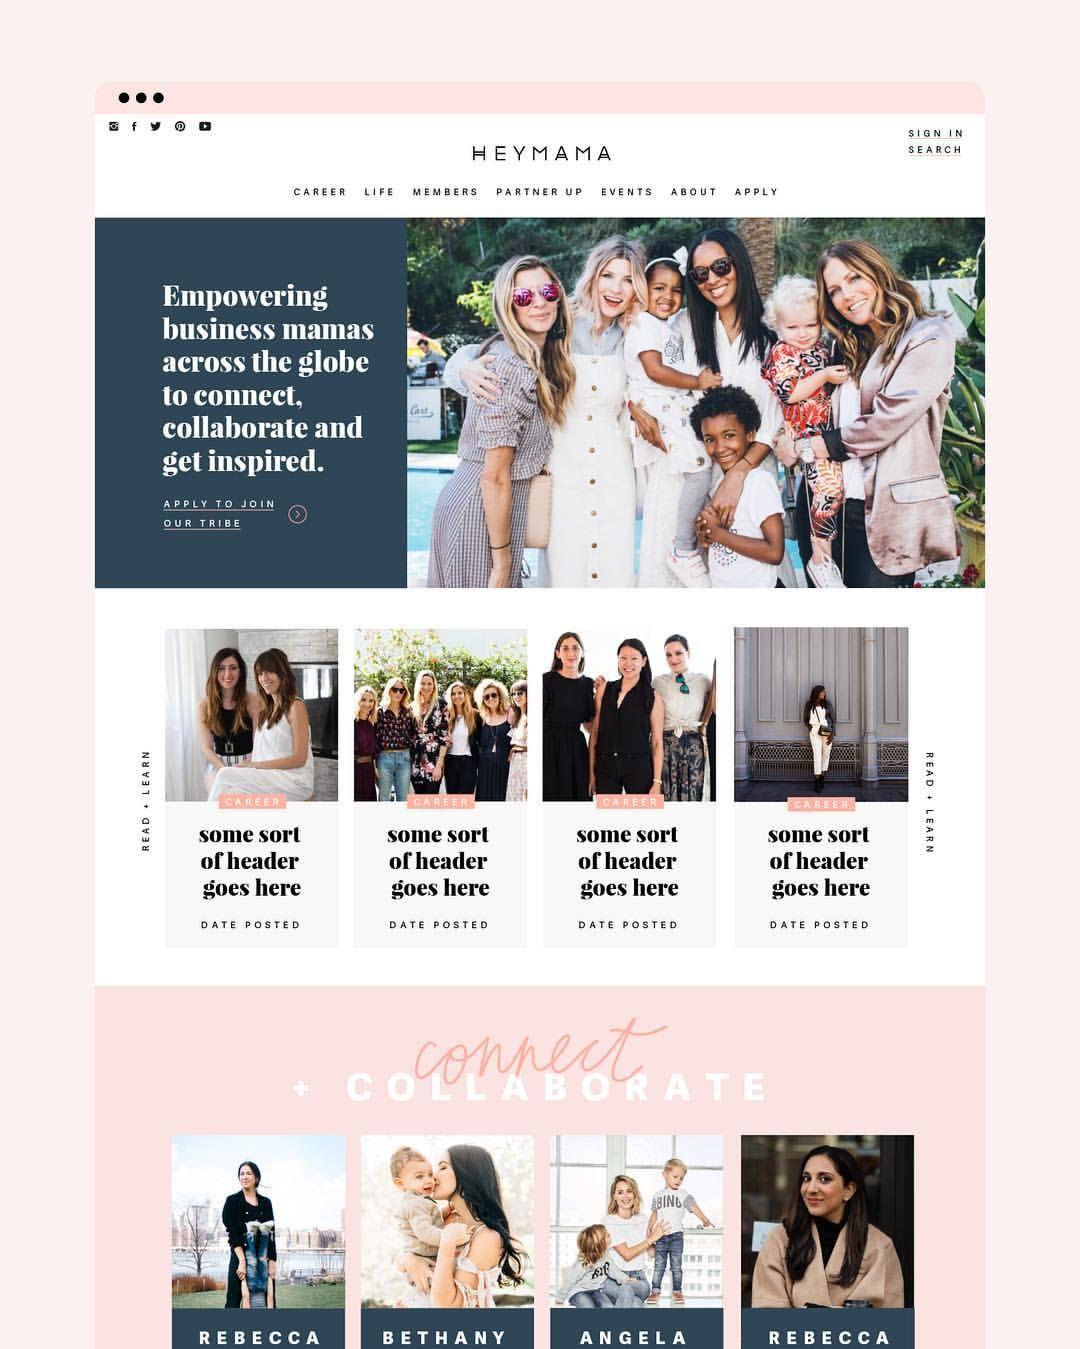 Website Design Heymama Mom Entrepreneurs Home Page Blush Navy Neutral Pink Inspiring Empowering Clean Website Design Web Design Tips Web Design Help